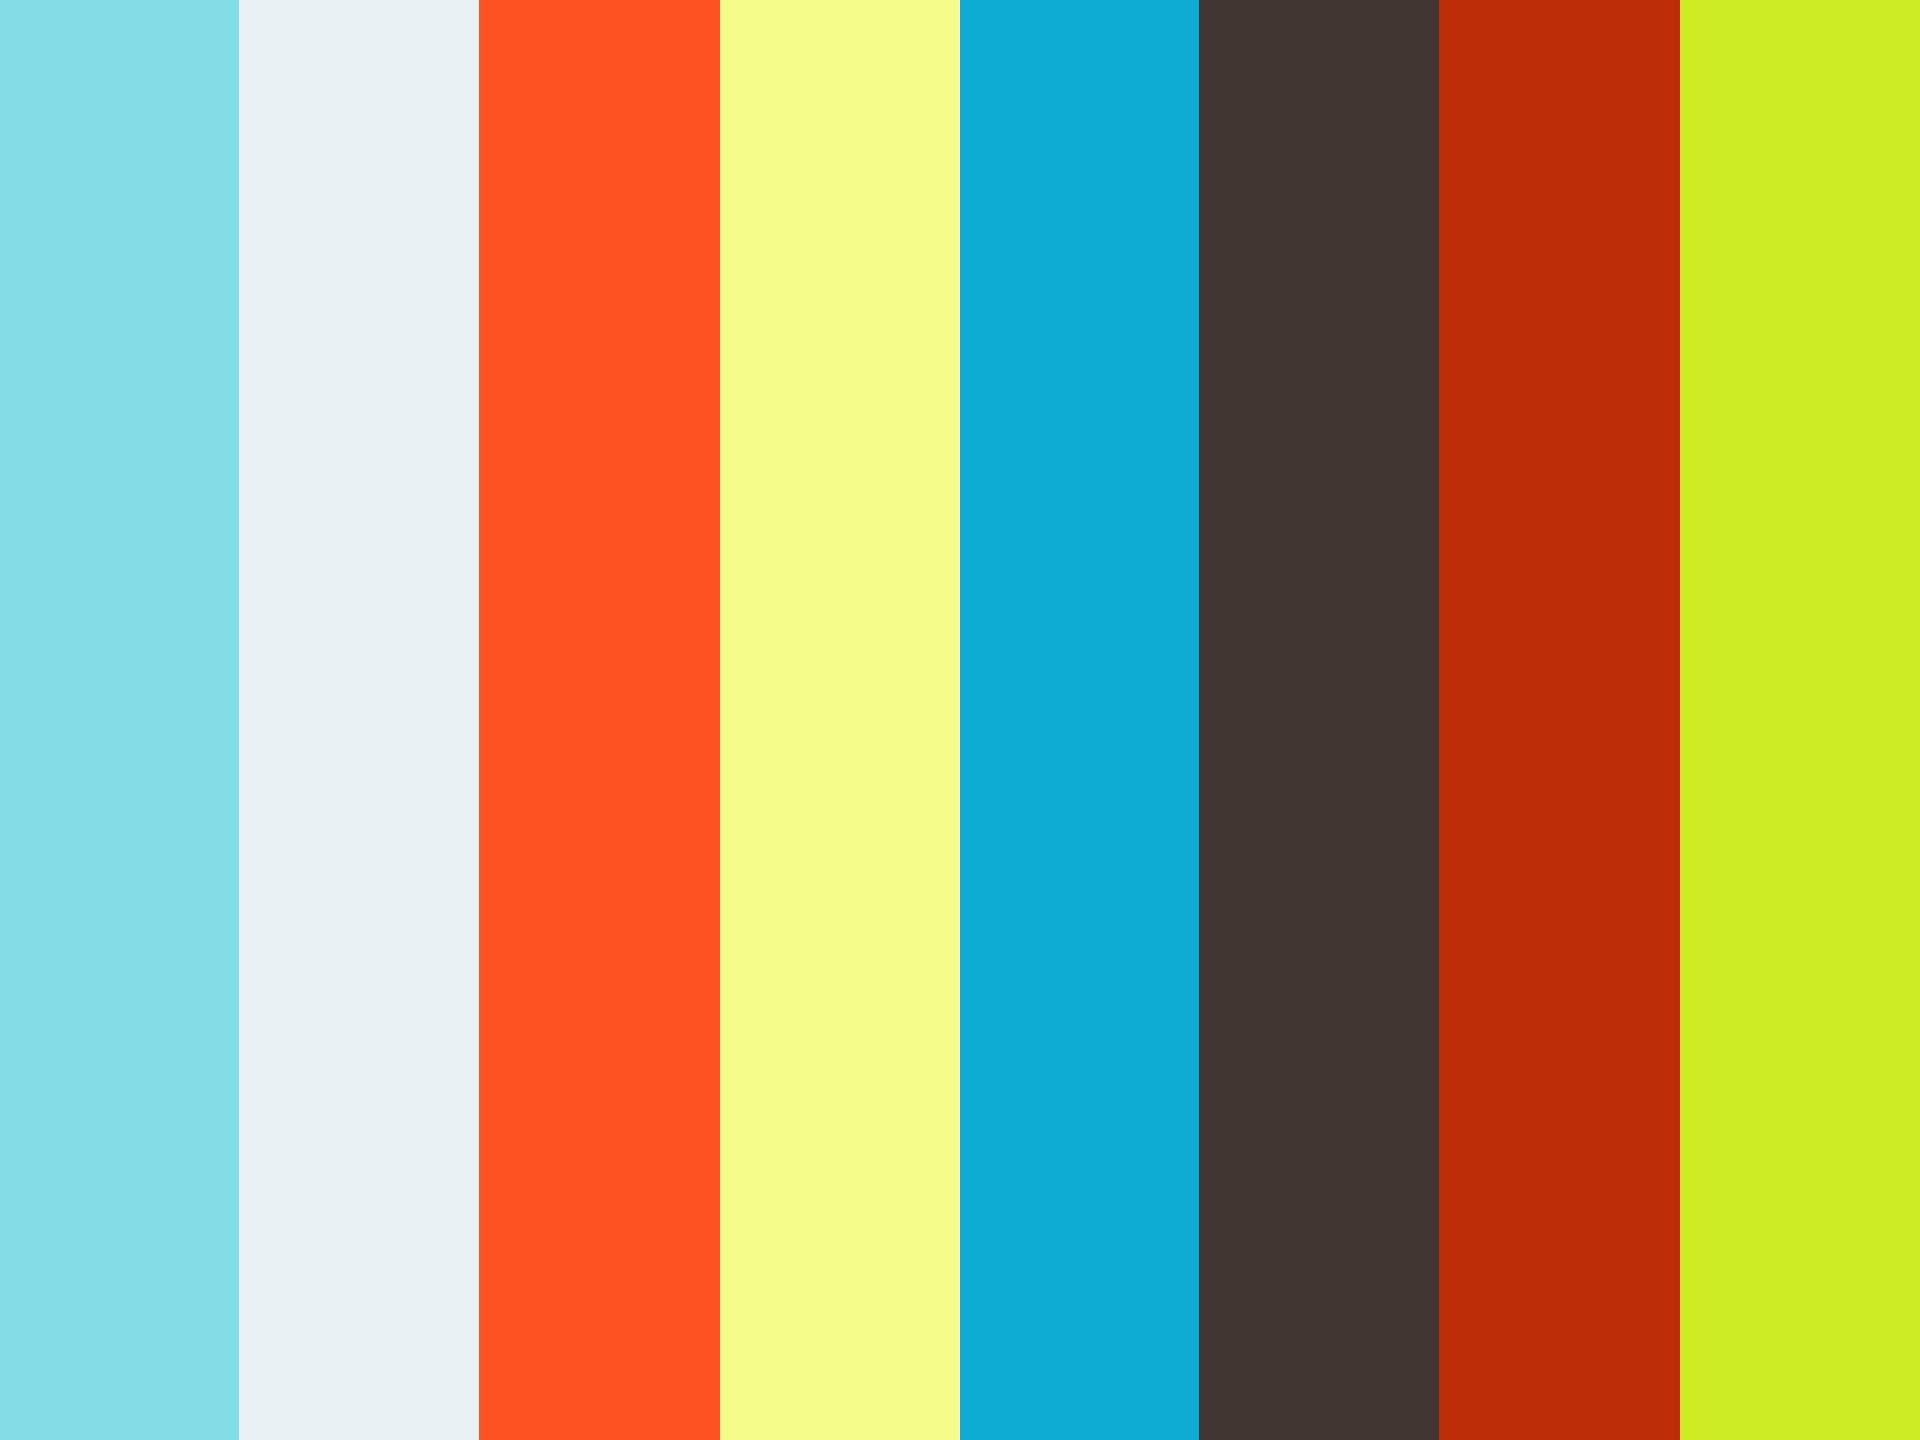 MERCEDES BENZ CL500 - BLACK - 2008 *EXPORT ONLY